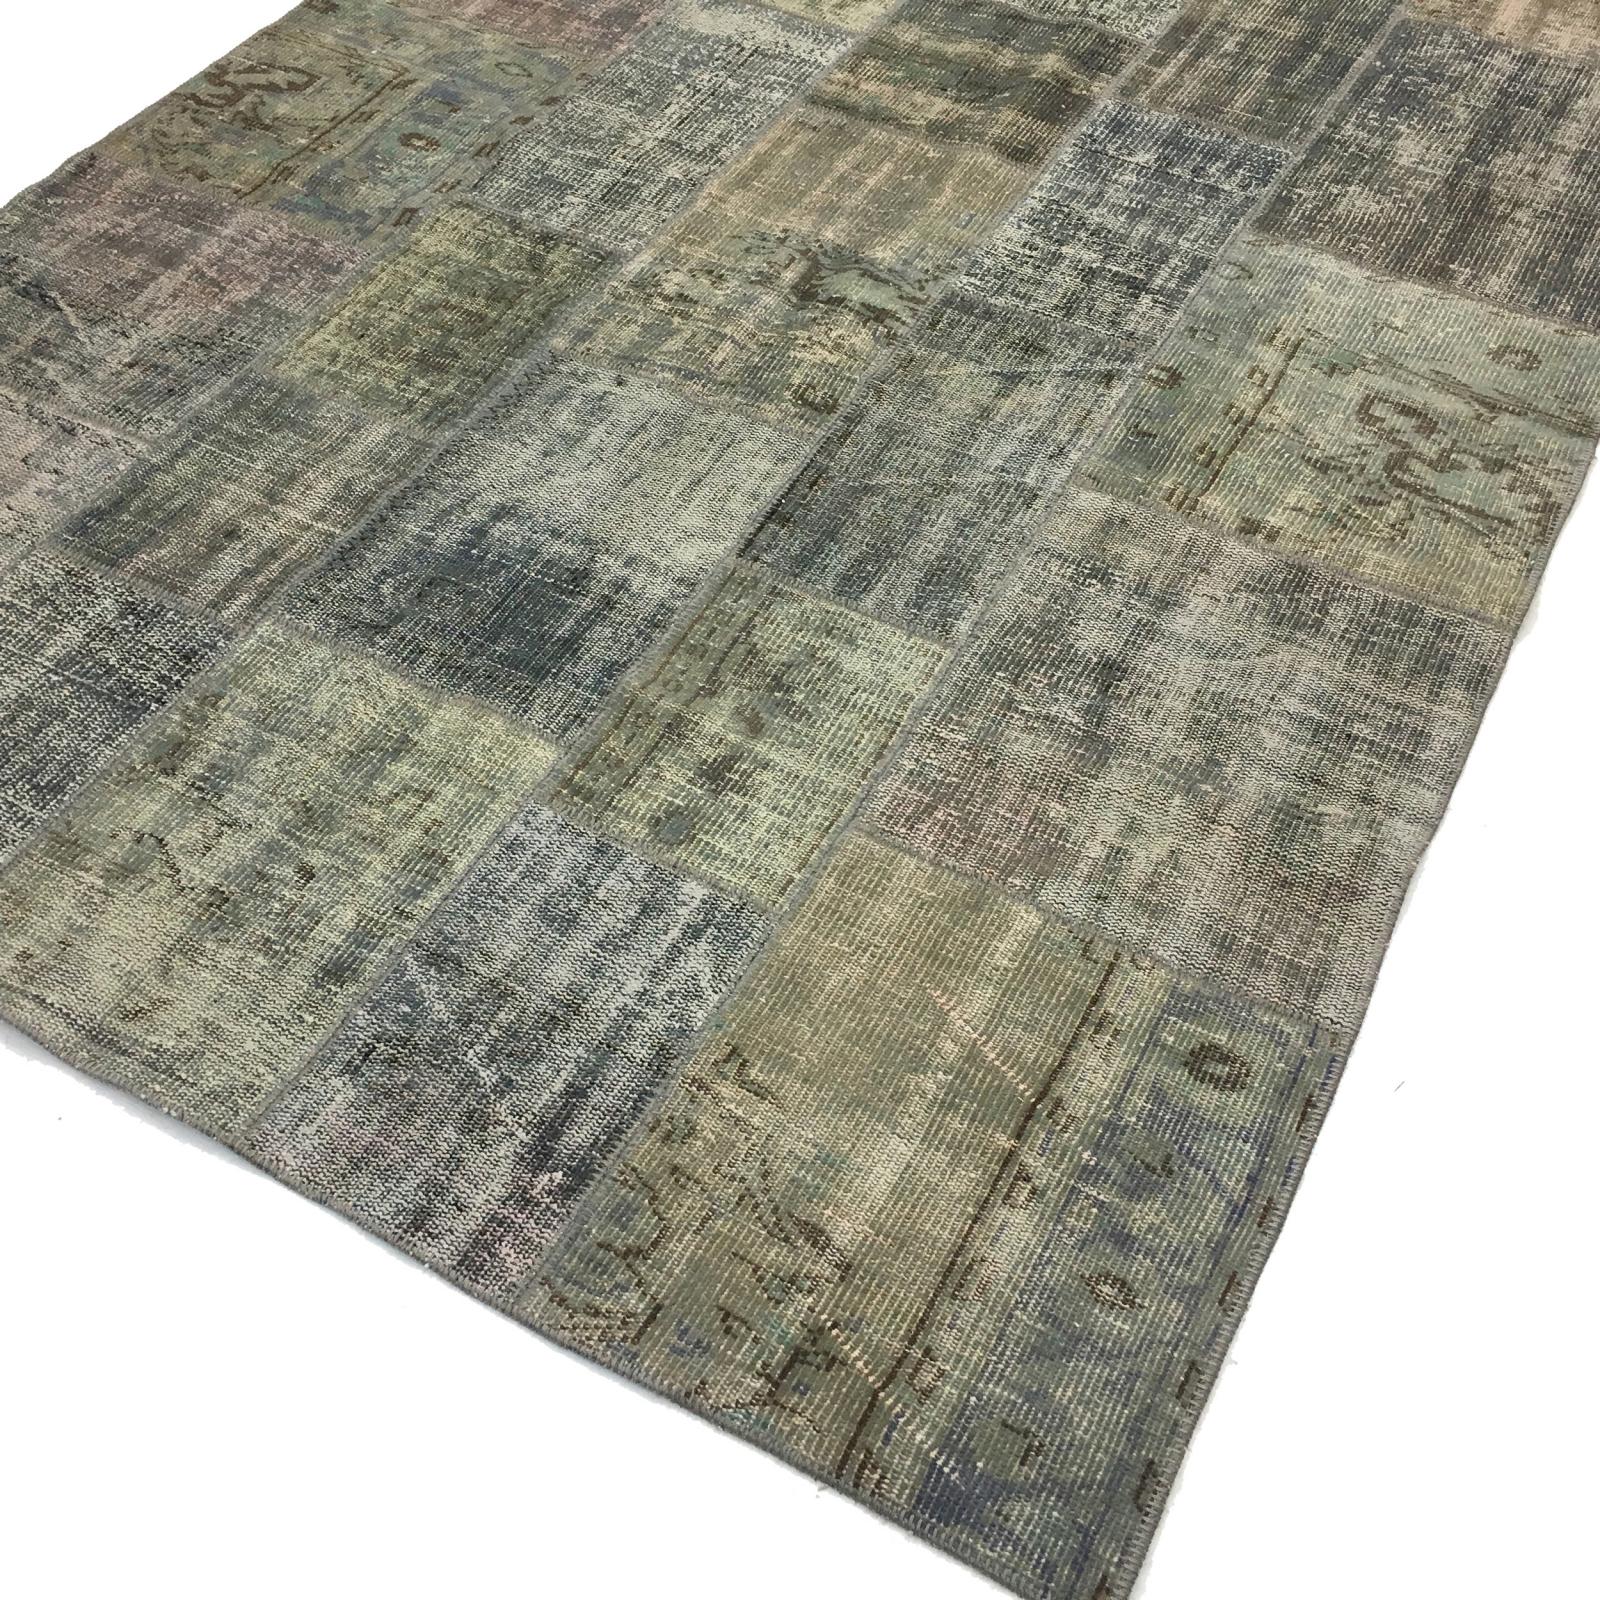 teppich farbe 07254620171102. Black Bedroom Furniture Sets. Home Design Ideas